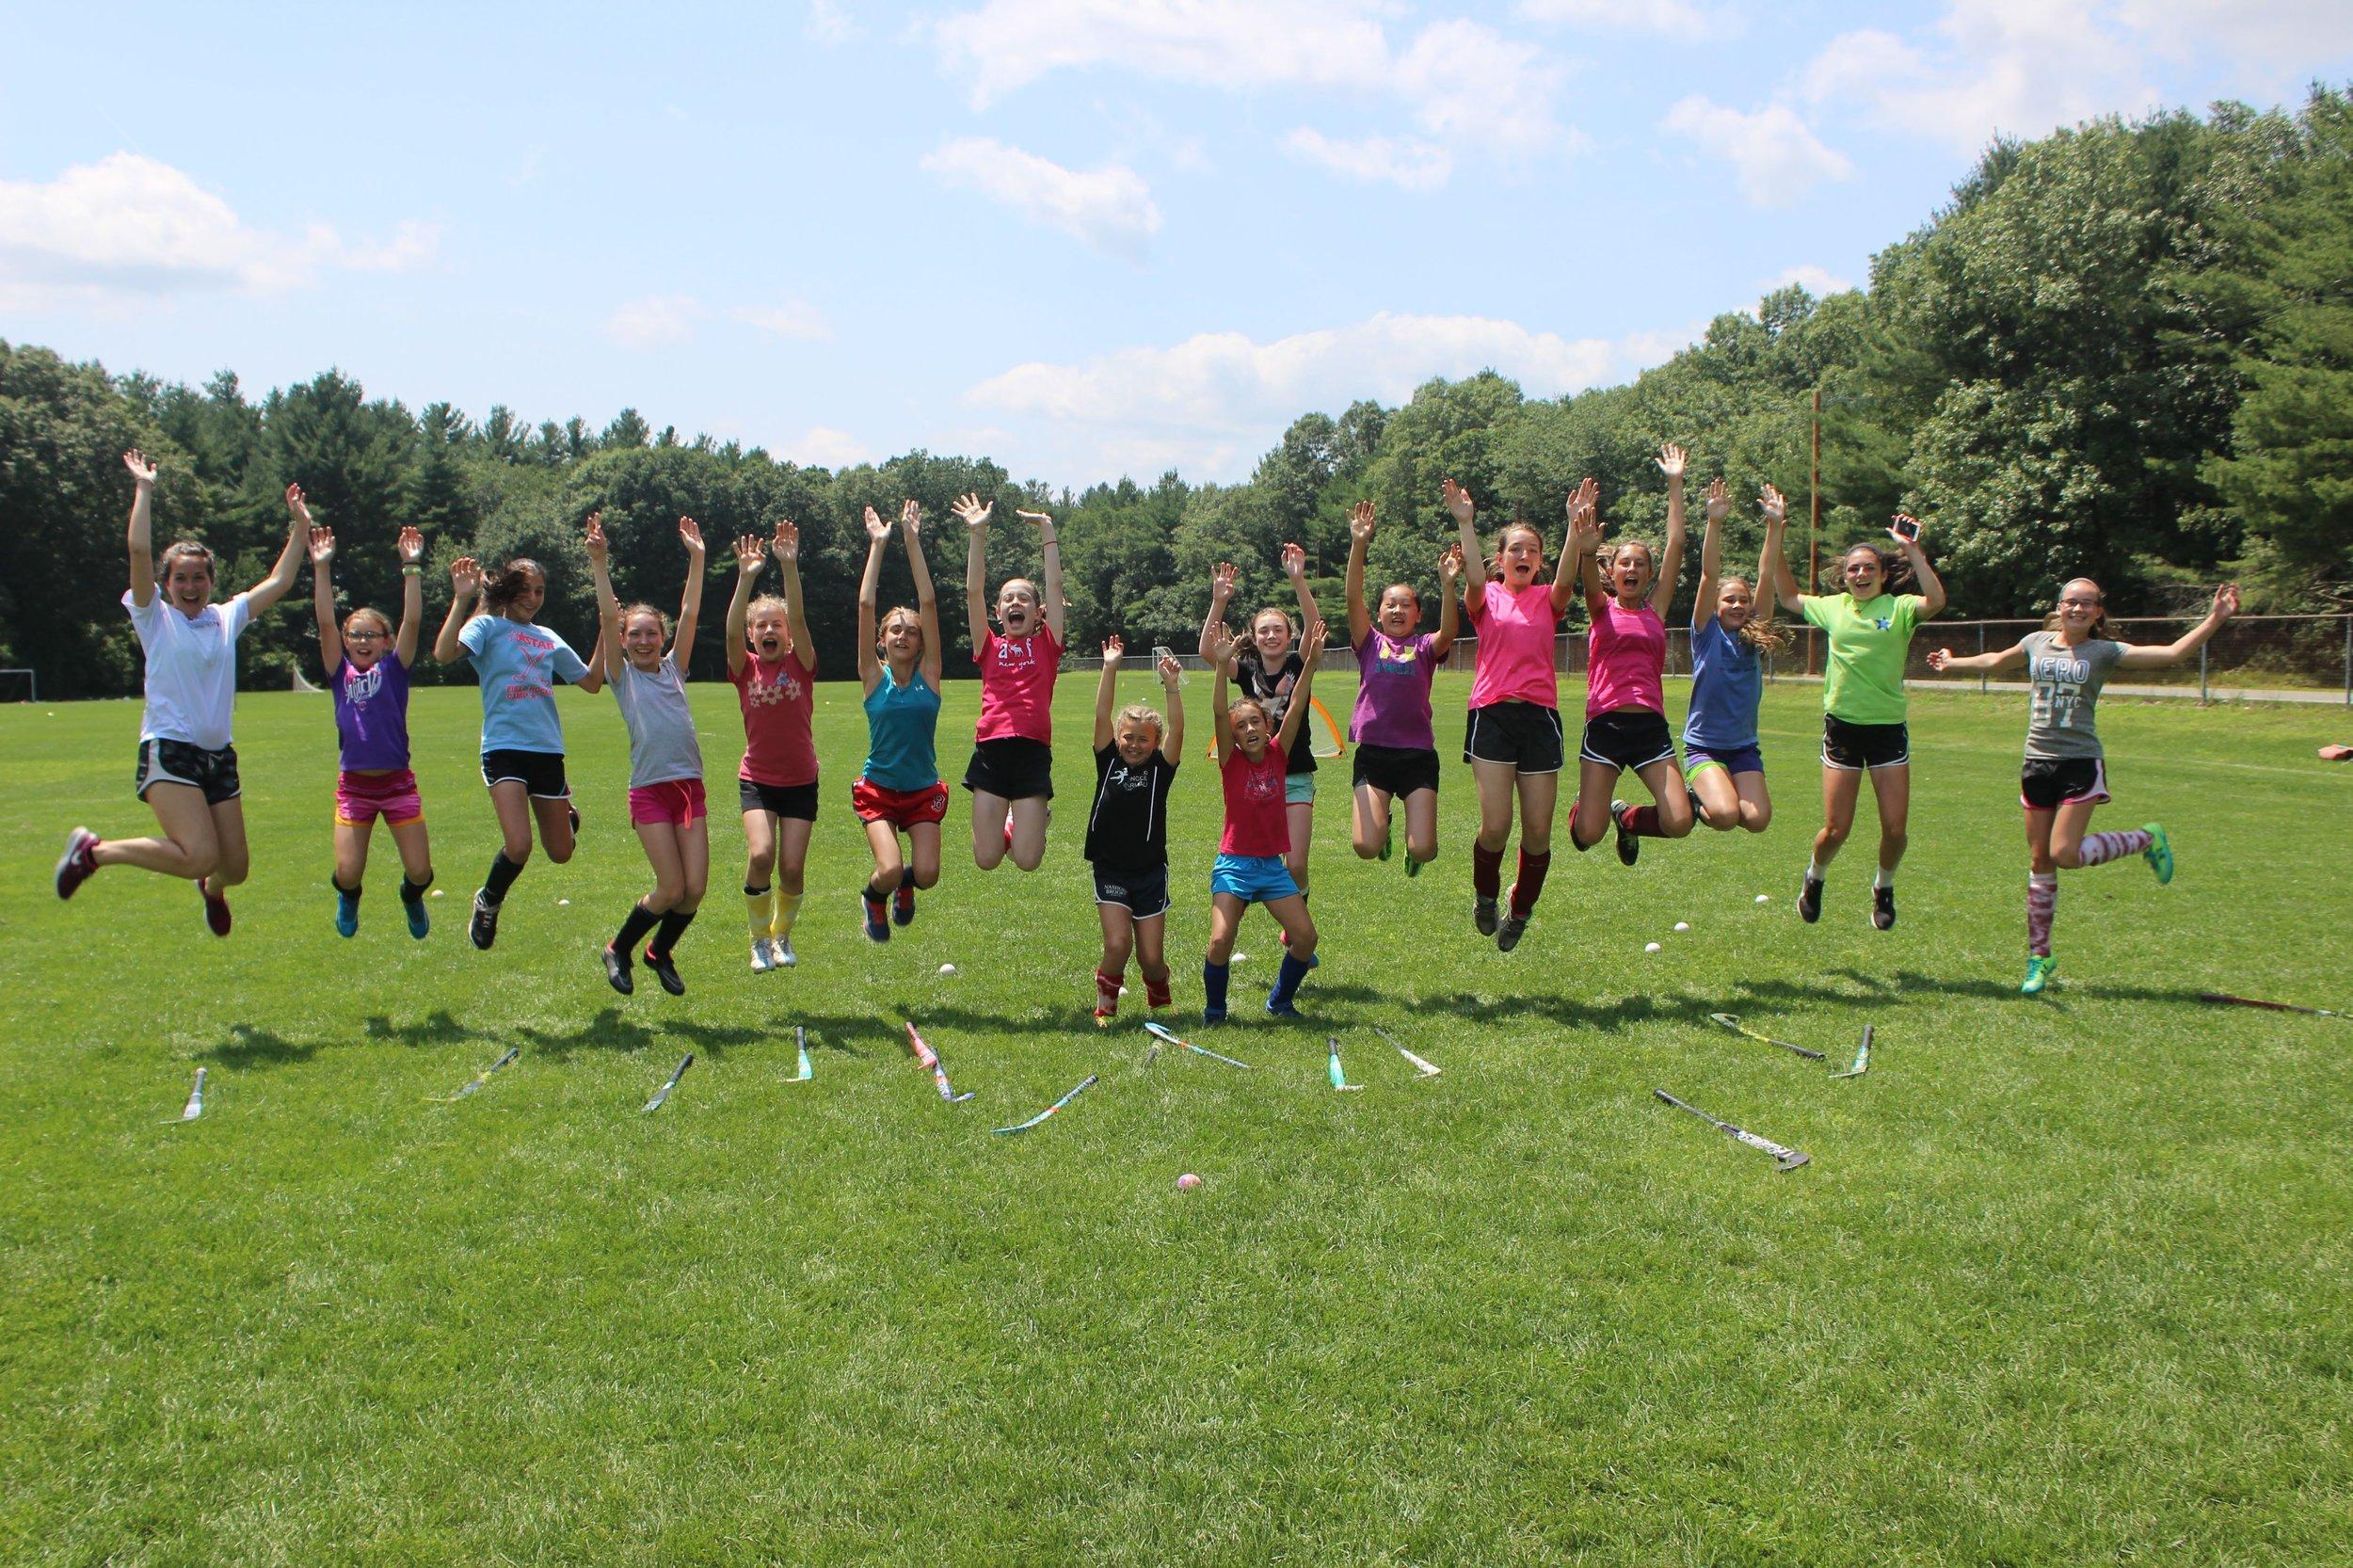 Field hockey girls.jpg